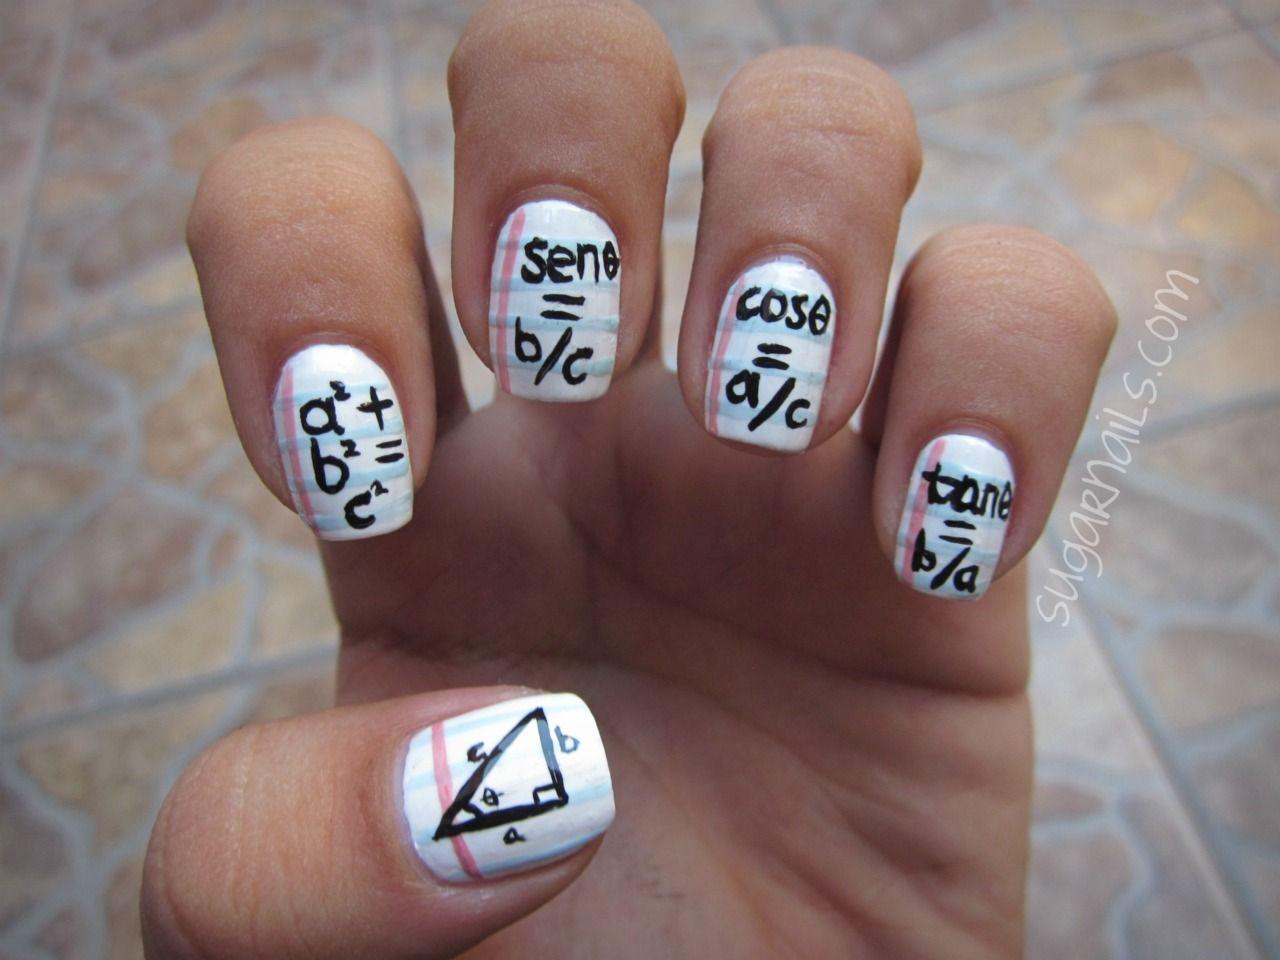 nerdy nails or creative cheating? hahah | Nails* | Pinterest ...